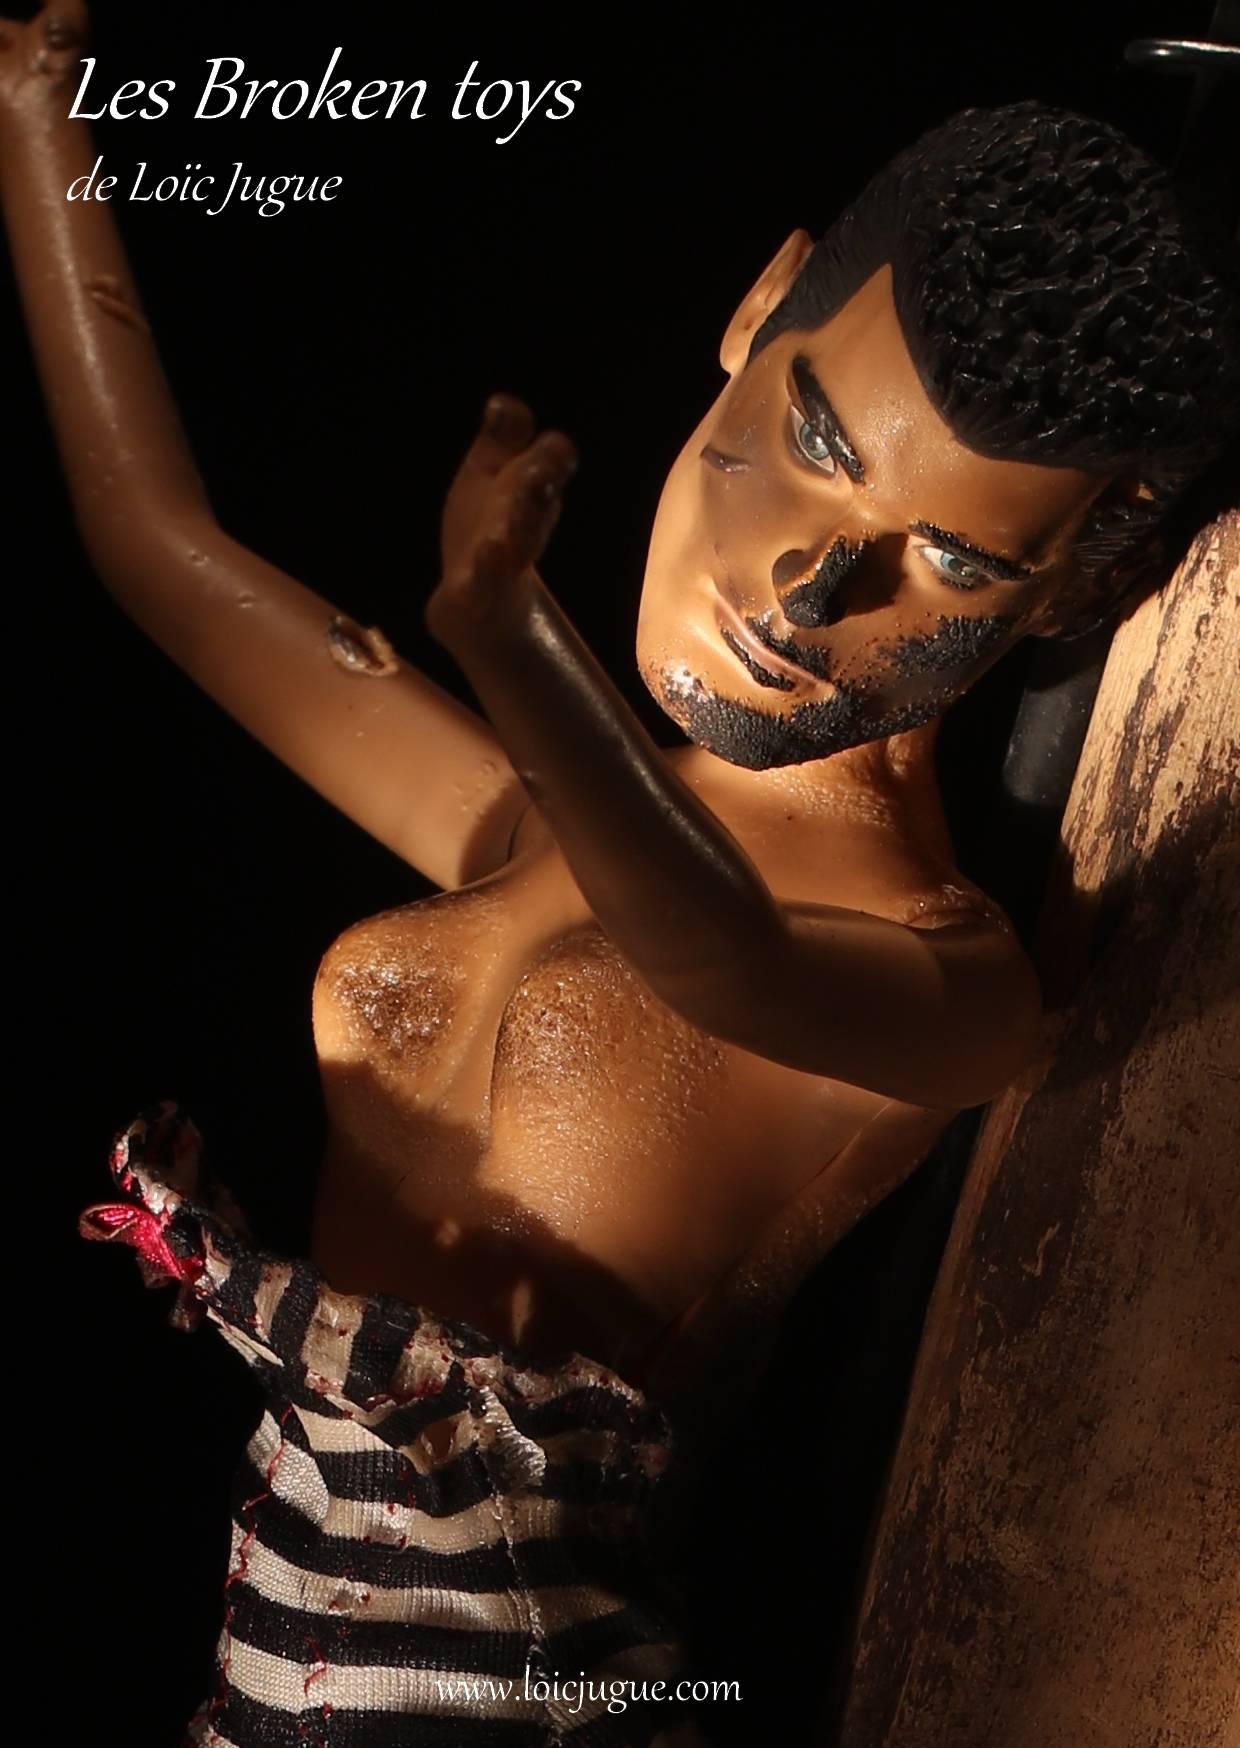 Les broken toys de Loïc Jugue:  La chute(détail)